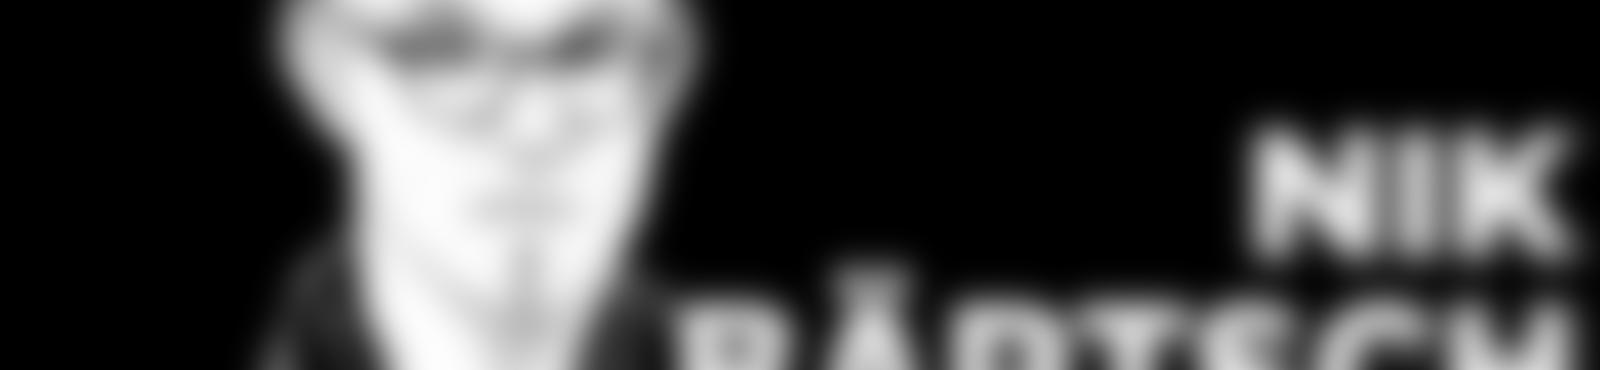 Blurred 806cd926 15c2 4c0a a828 fd51c7071d54